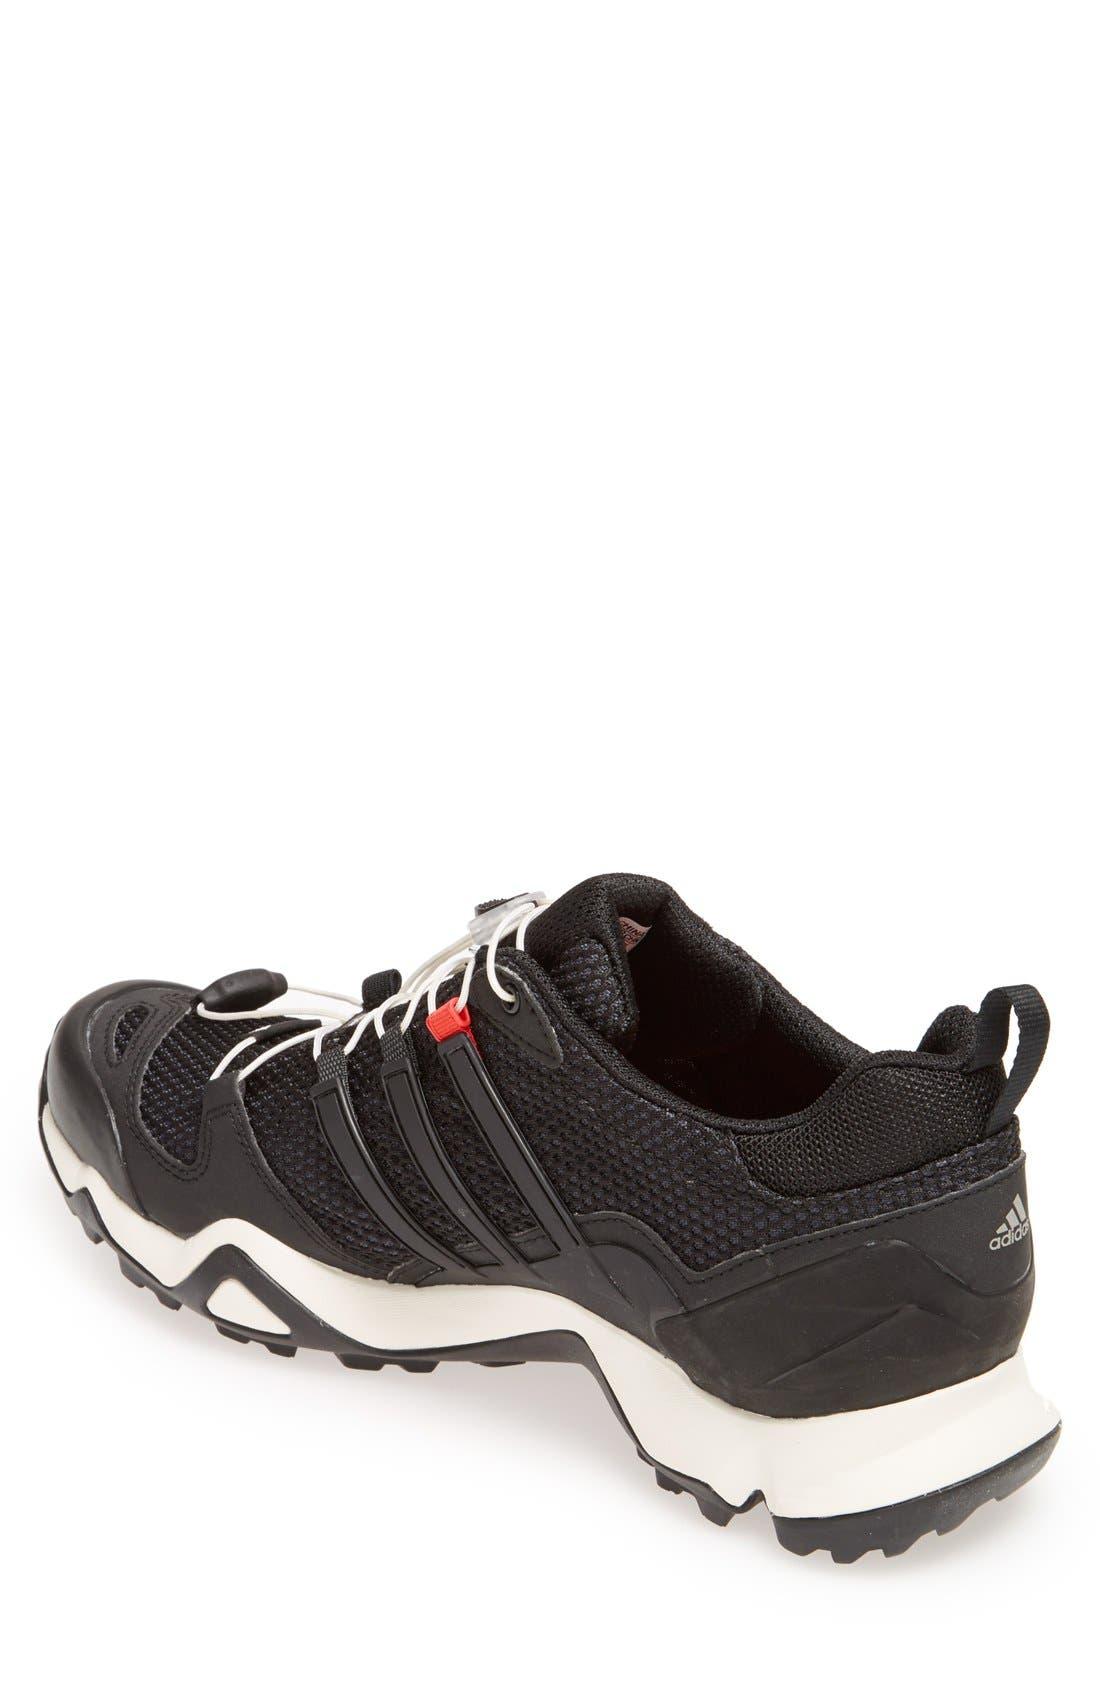 'Terrex Swift R' Hiking Shoe,                             Alternate thumbnail 4, color,                             001